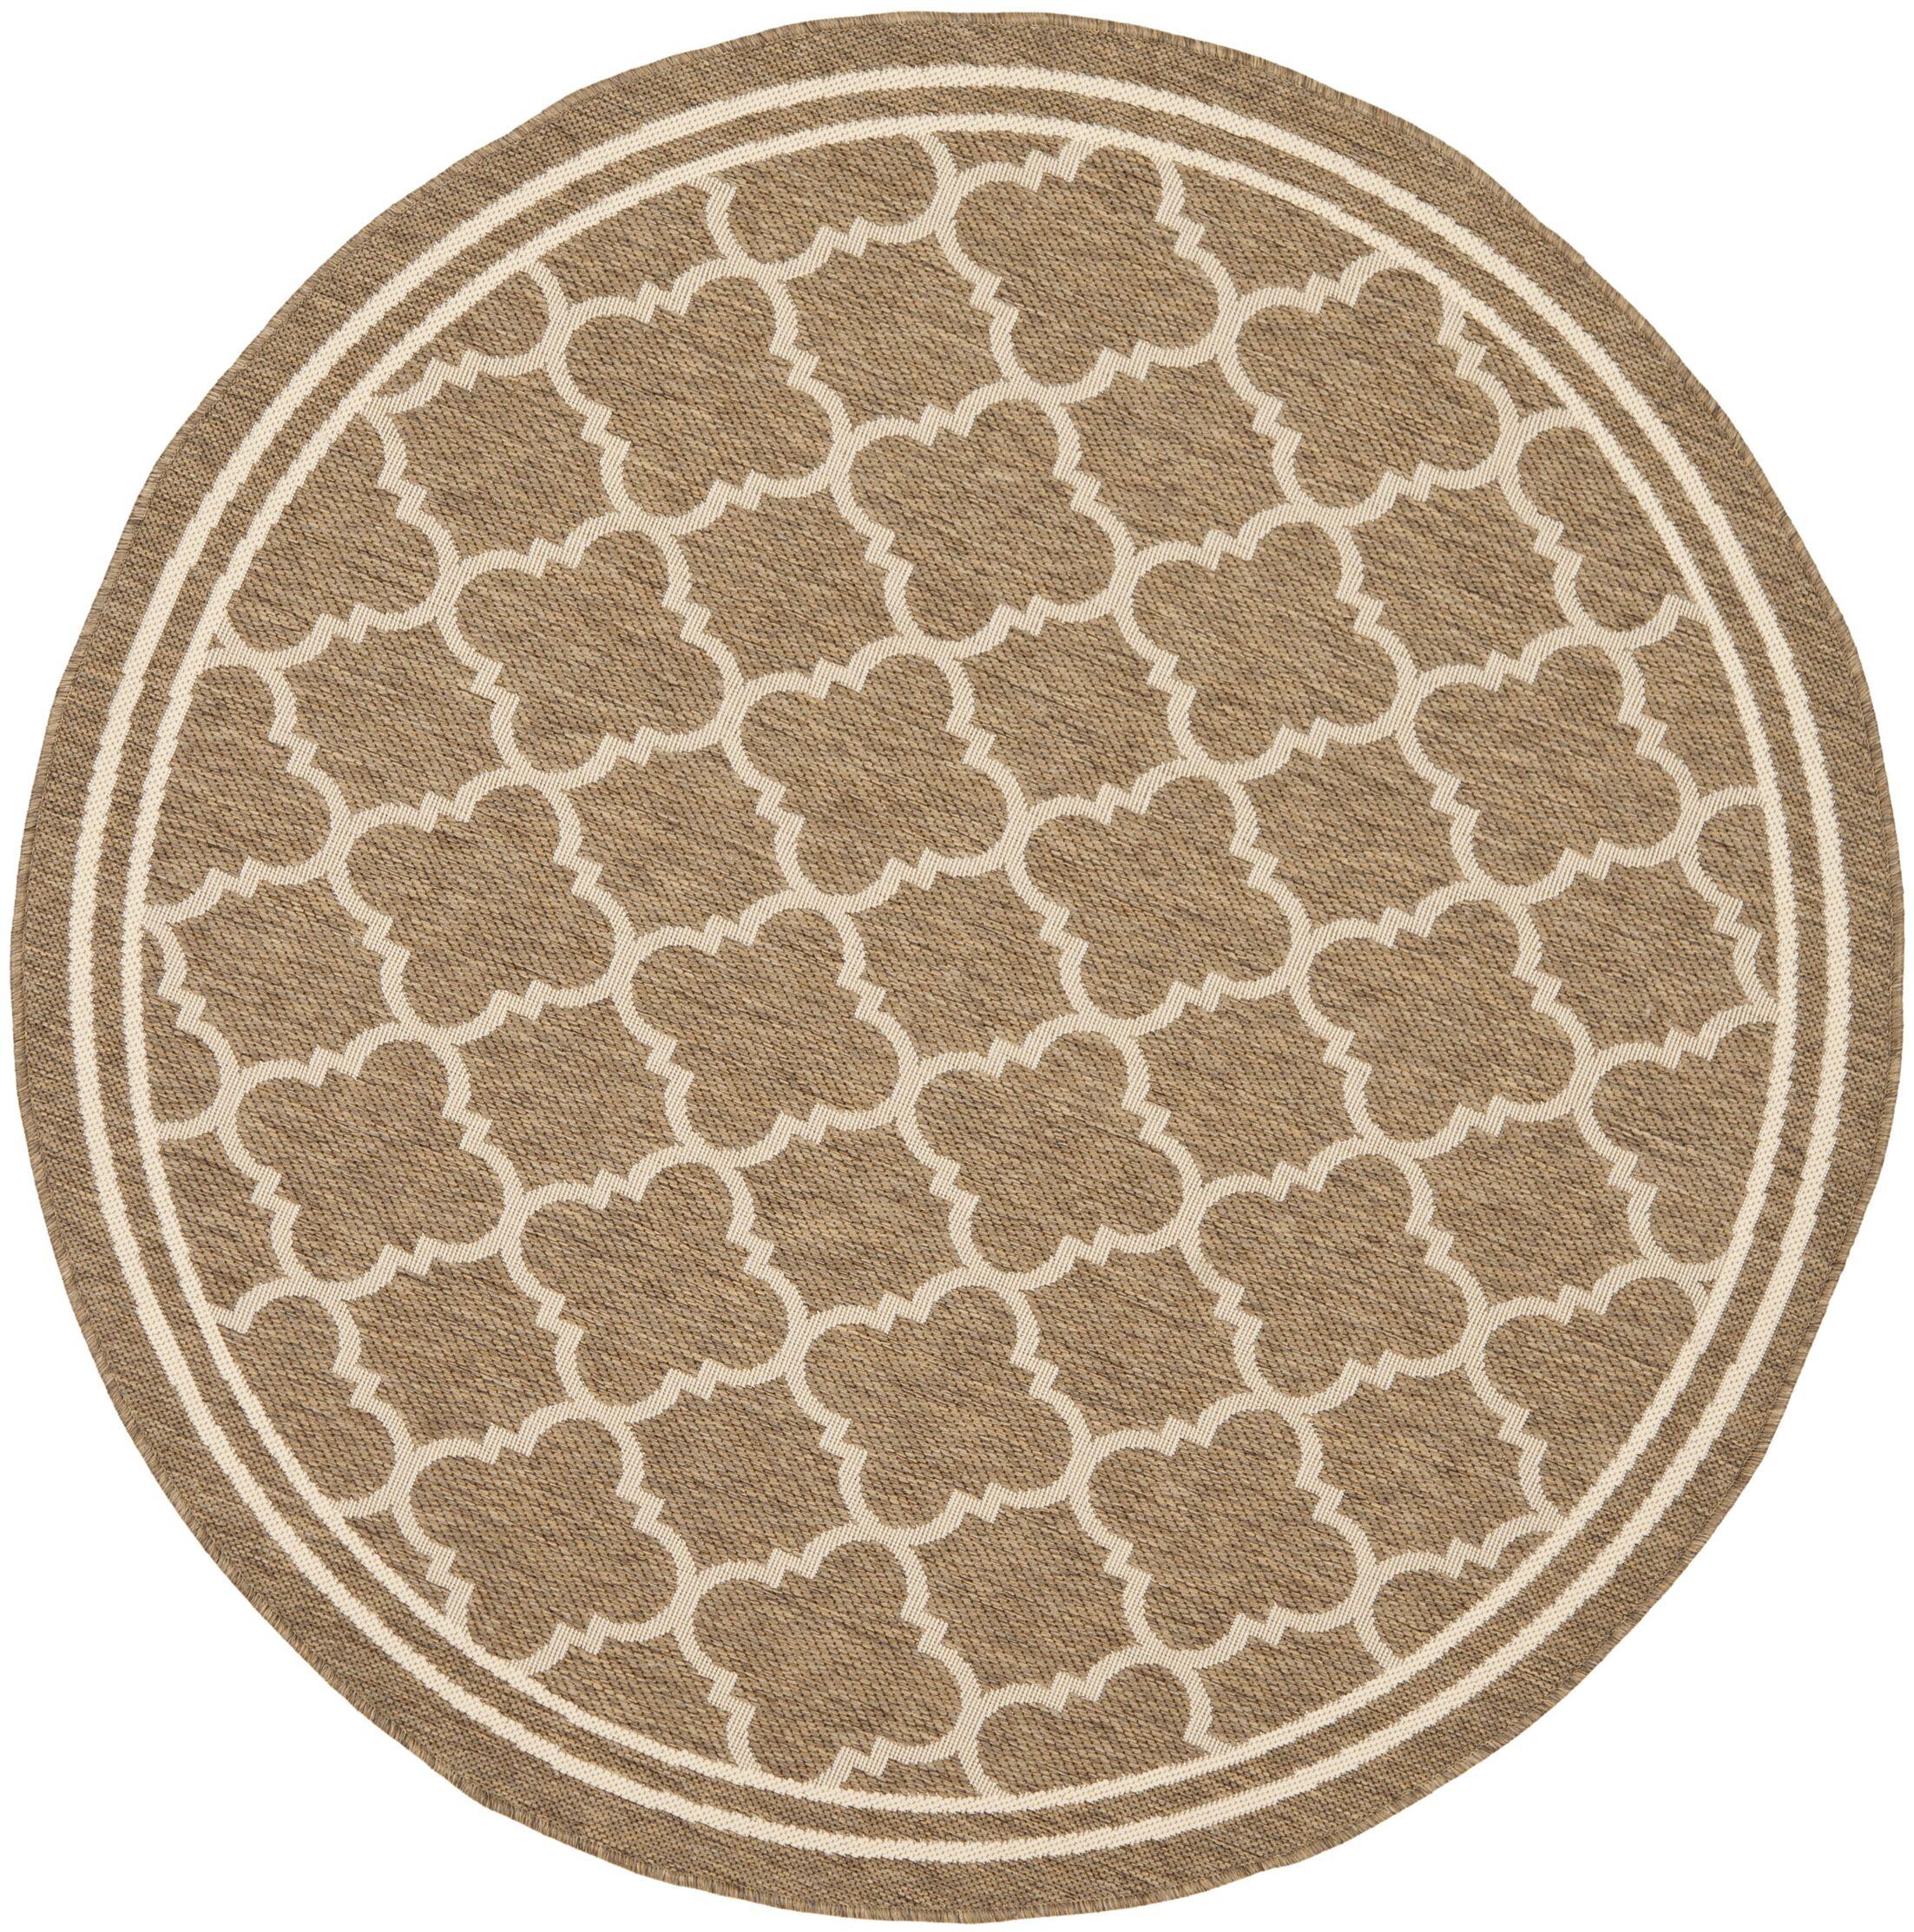 Short Brown/Bone Outdoor Area Rug Rug Size: Round 5'3